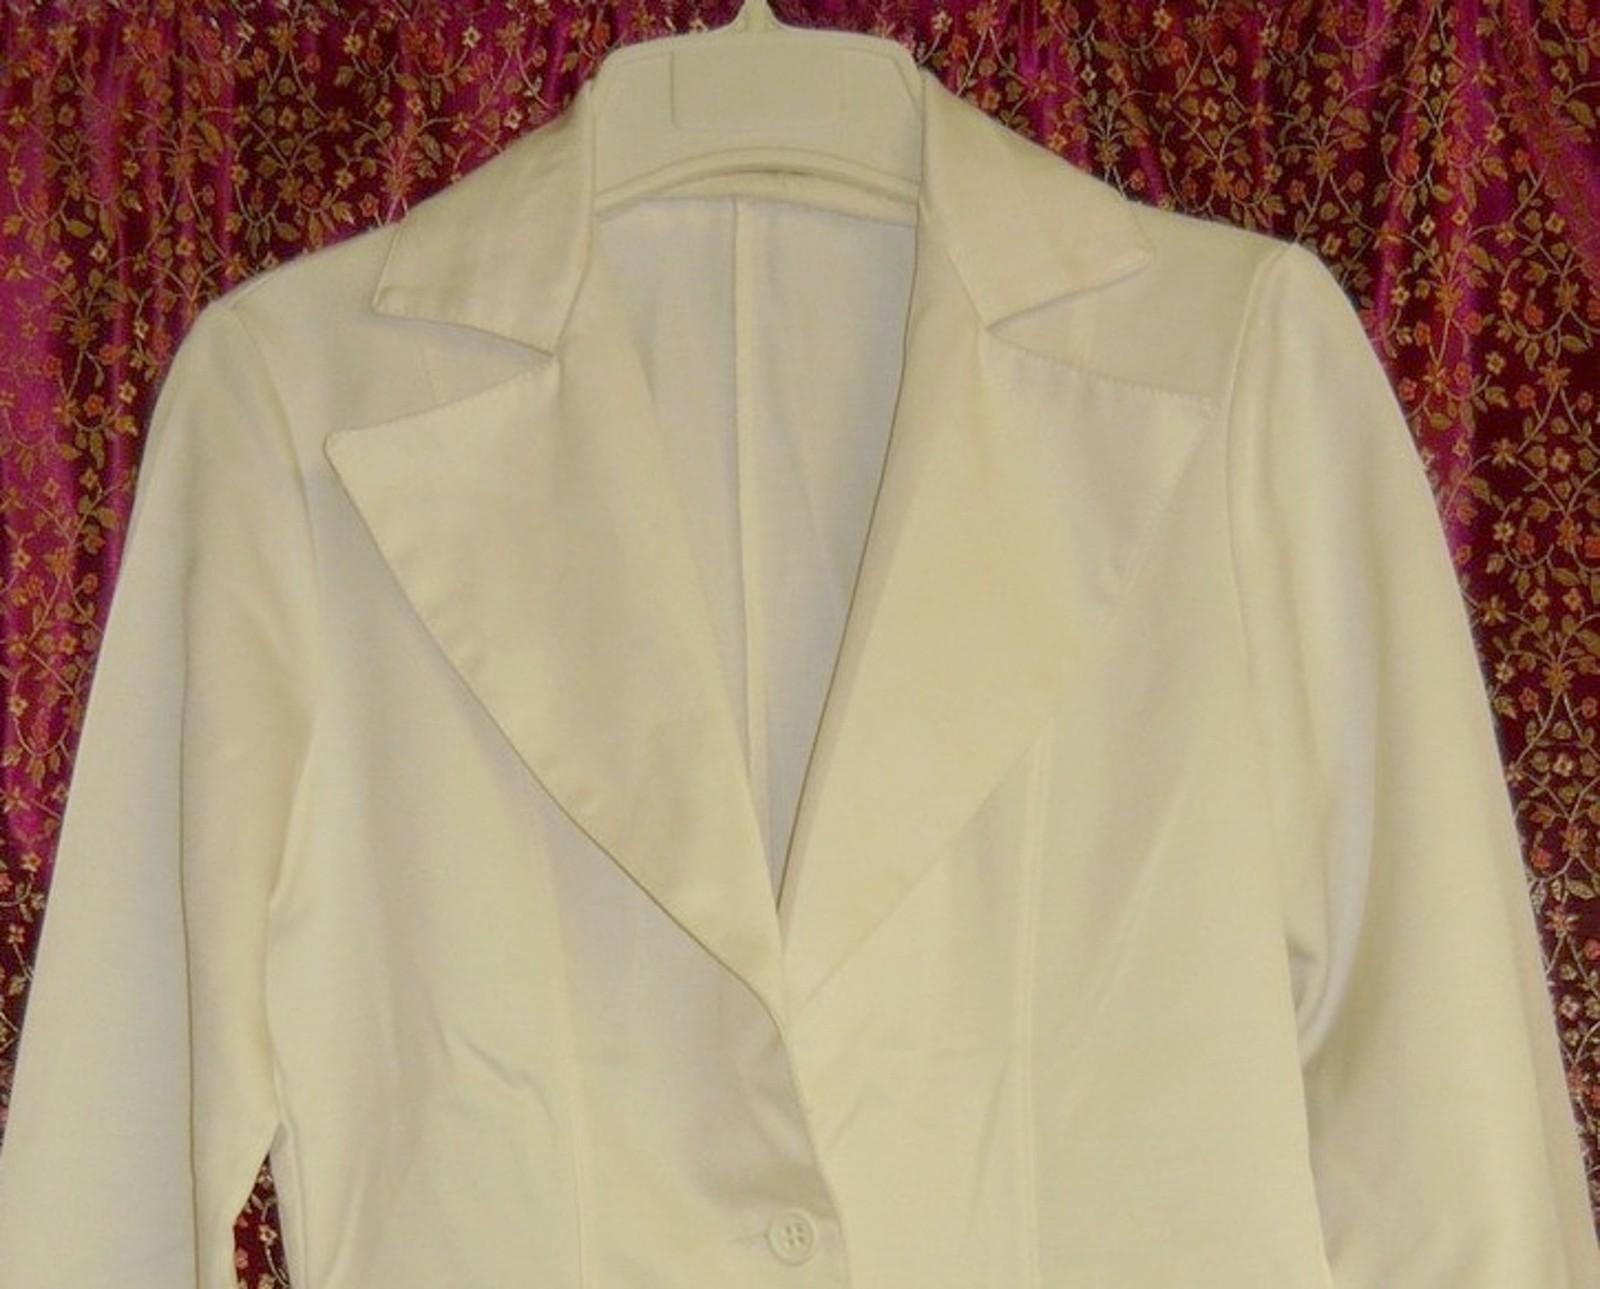 70'S  Disco Fever White Blazer/Jacket sz.  S/M